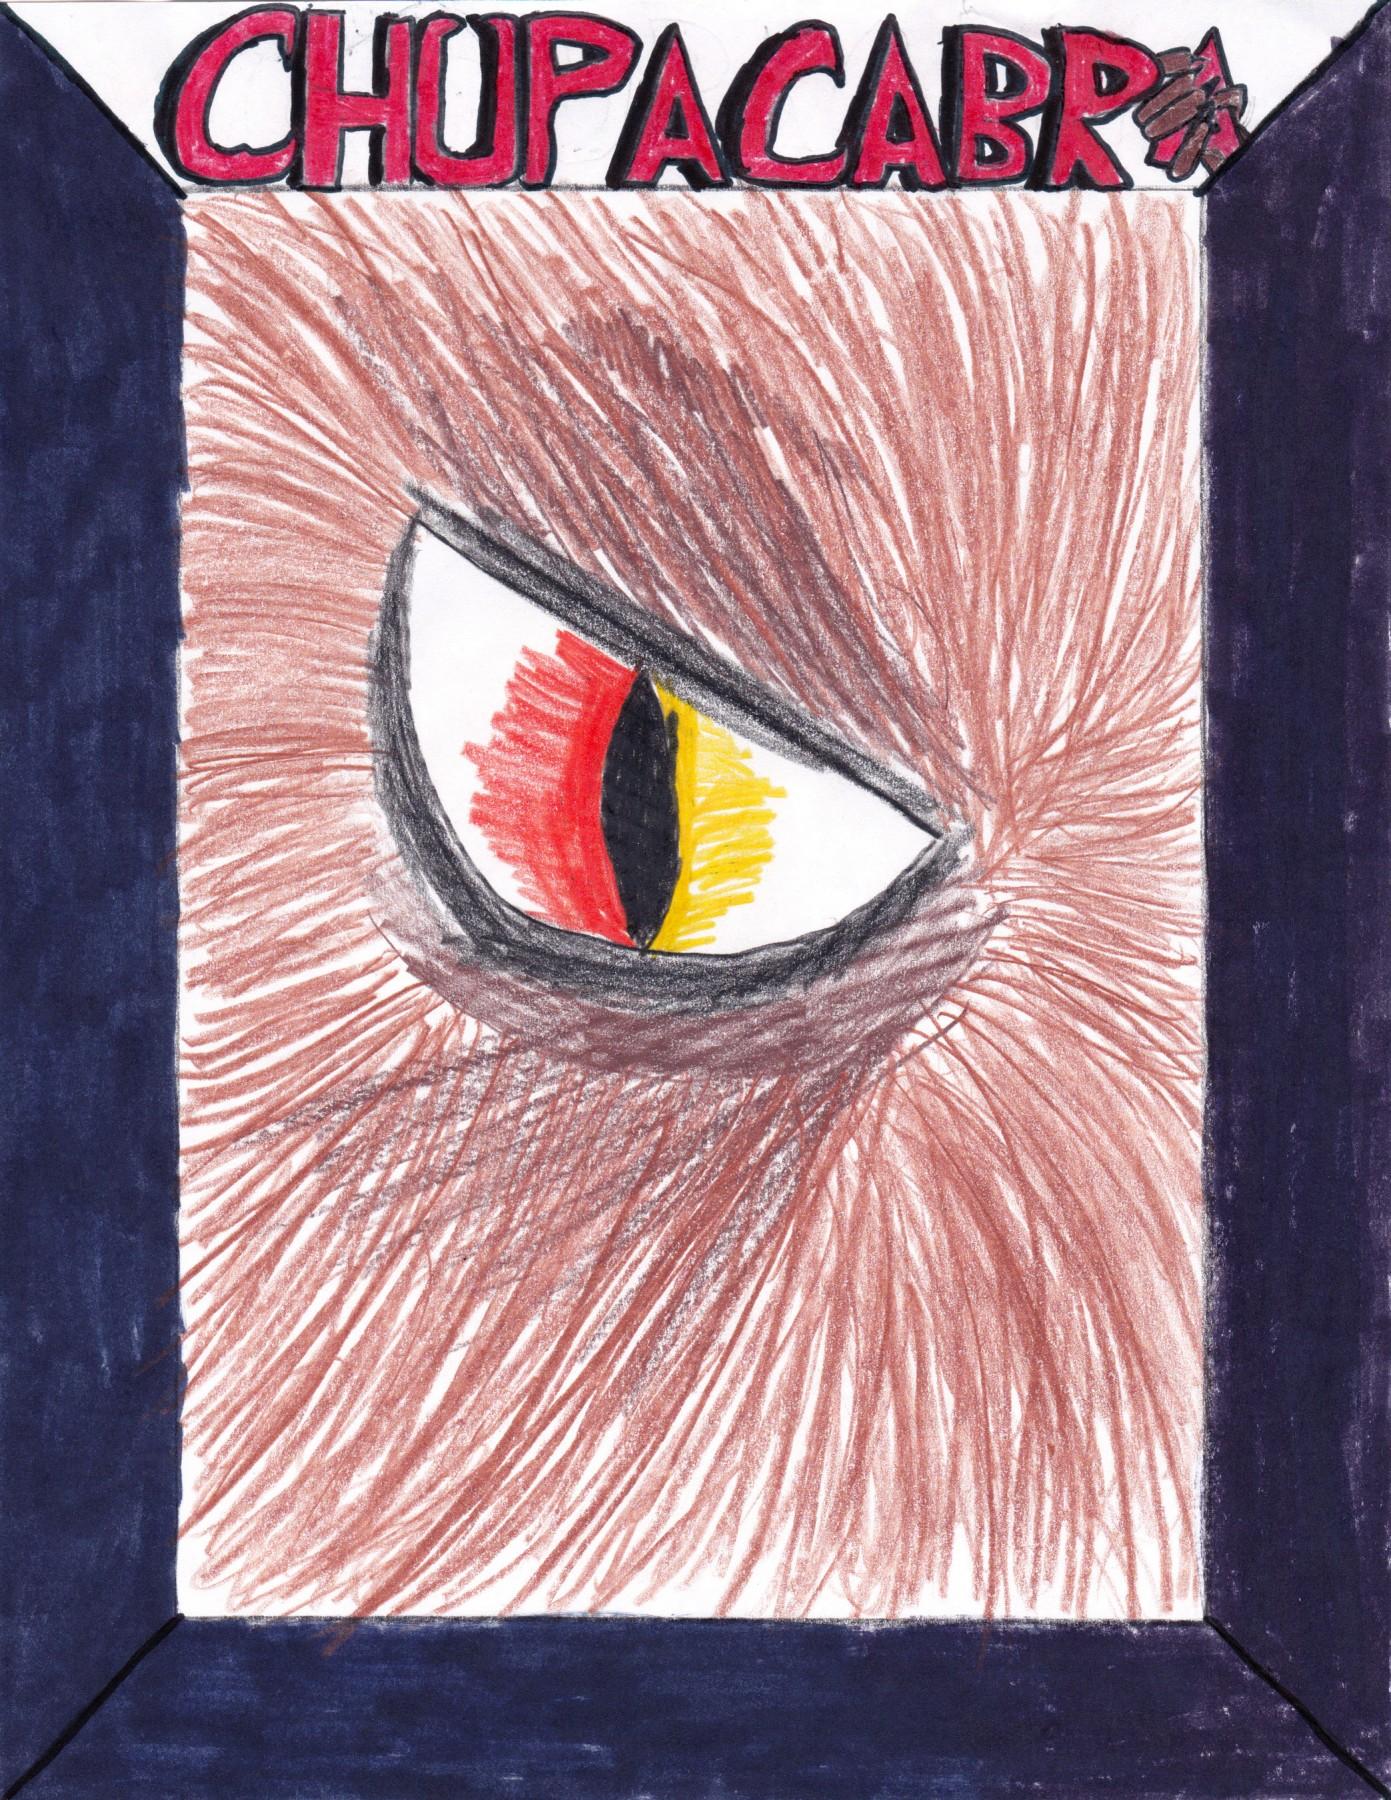 Chupacabra, by Ian Clifford - Age 12